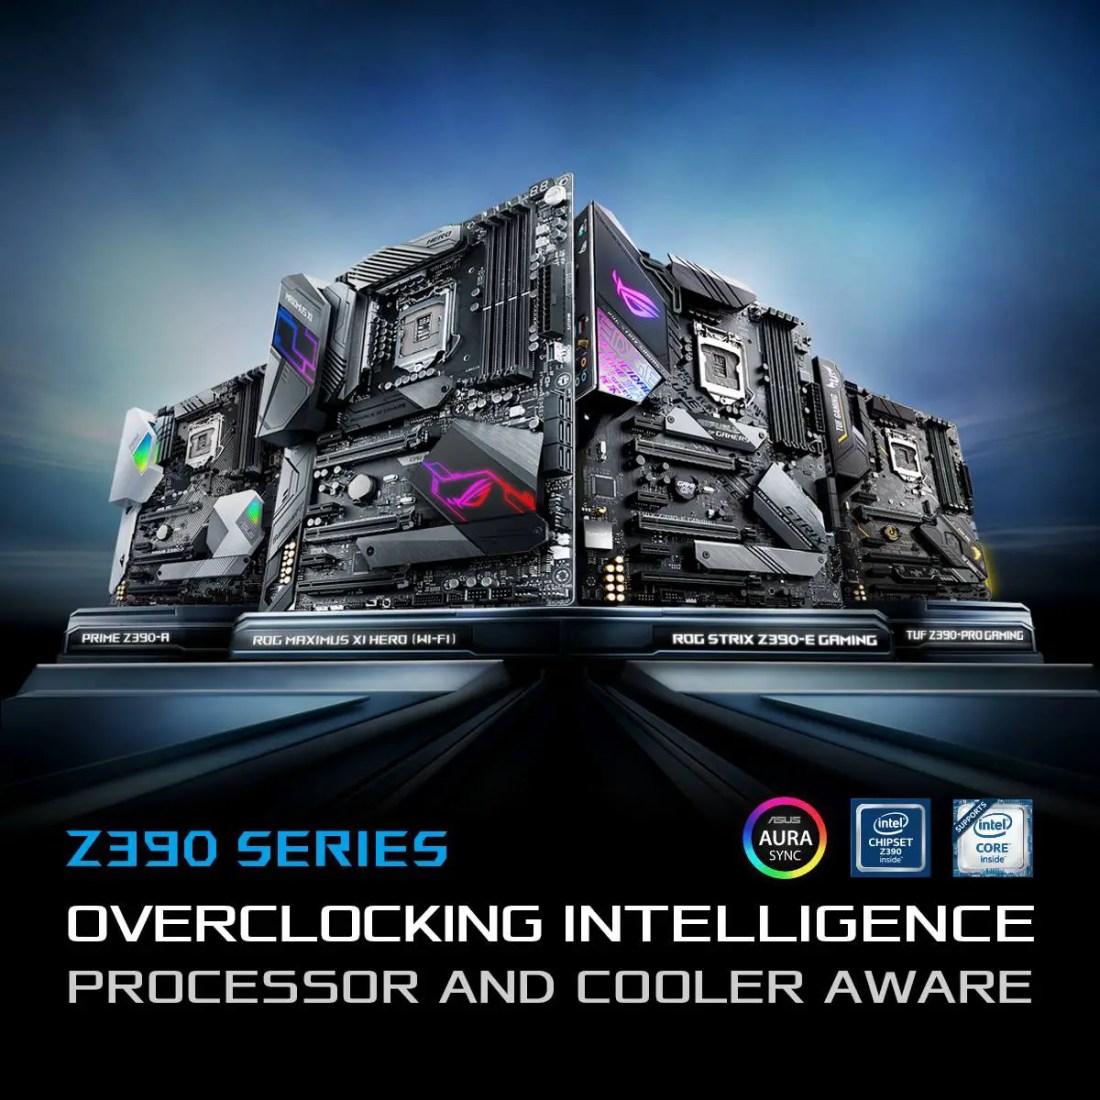 ASUS Z390 ROG Strix TUF Gaming Prime